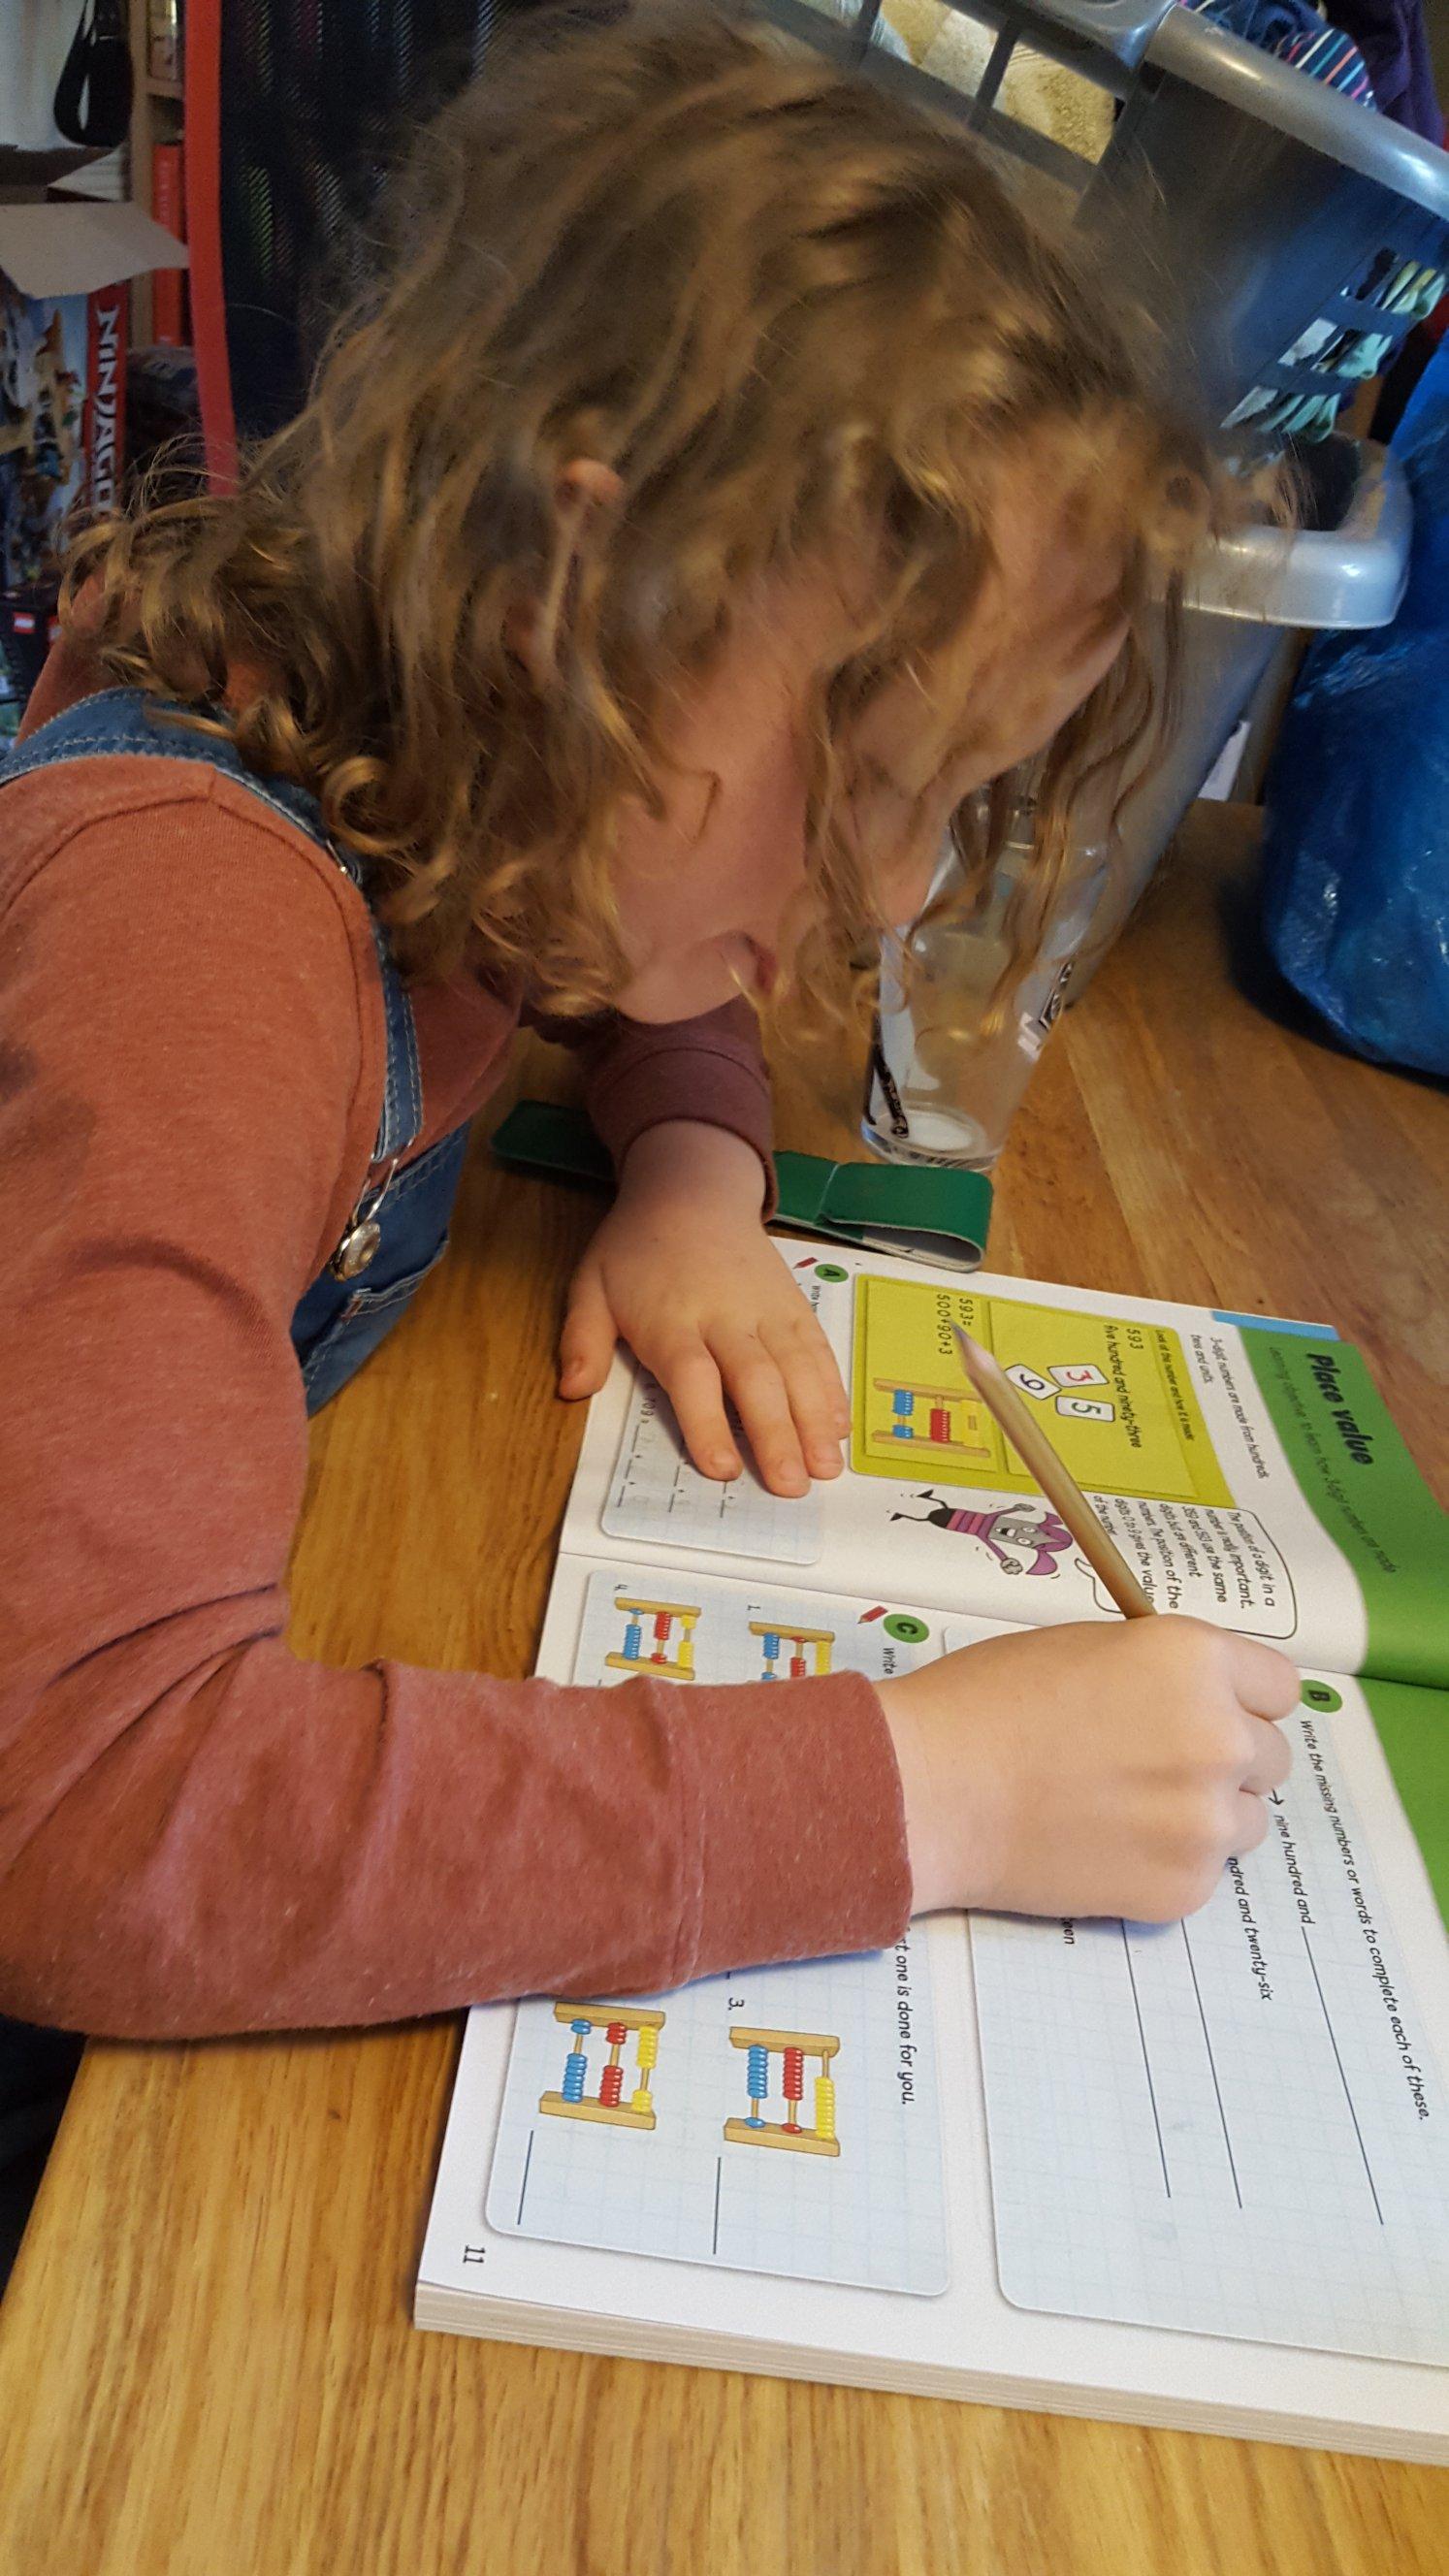 Completing a worksheet